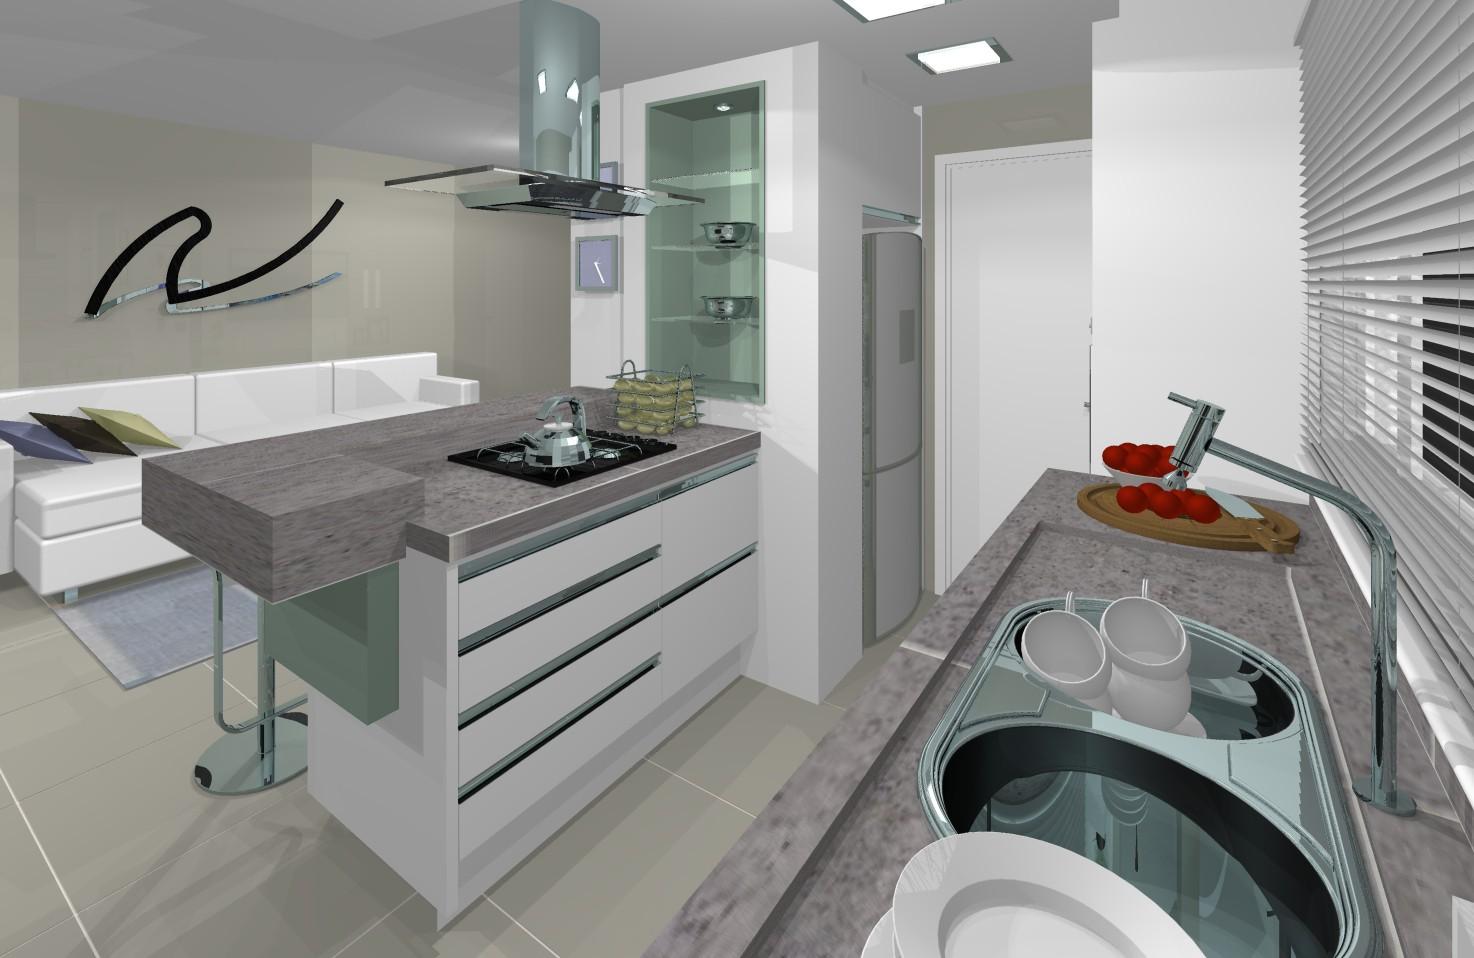 design de interiores: cozinha integrada #643C2C 1474 958